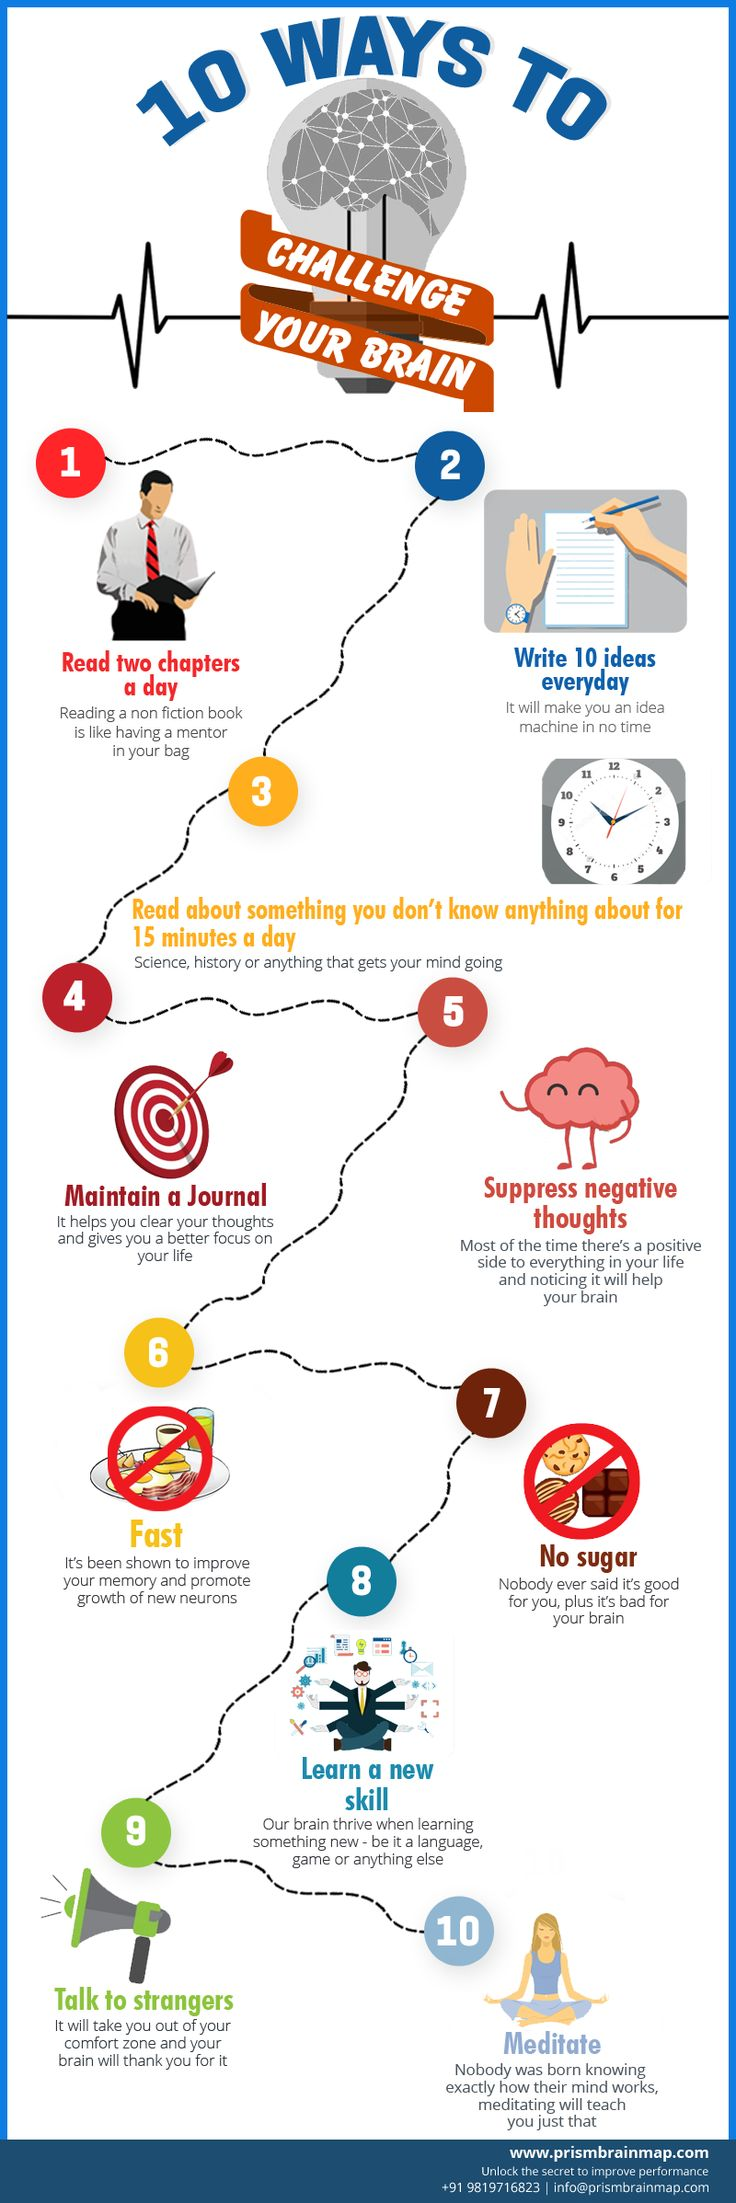 10 Ways To Challenge Your Brain! Use Prism Brain Map Neurosciencebased  Online Tool